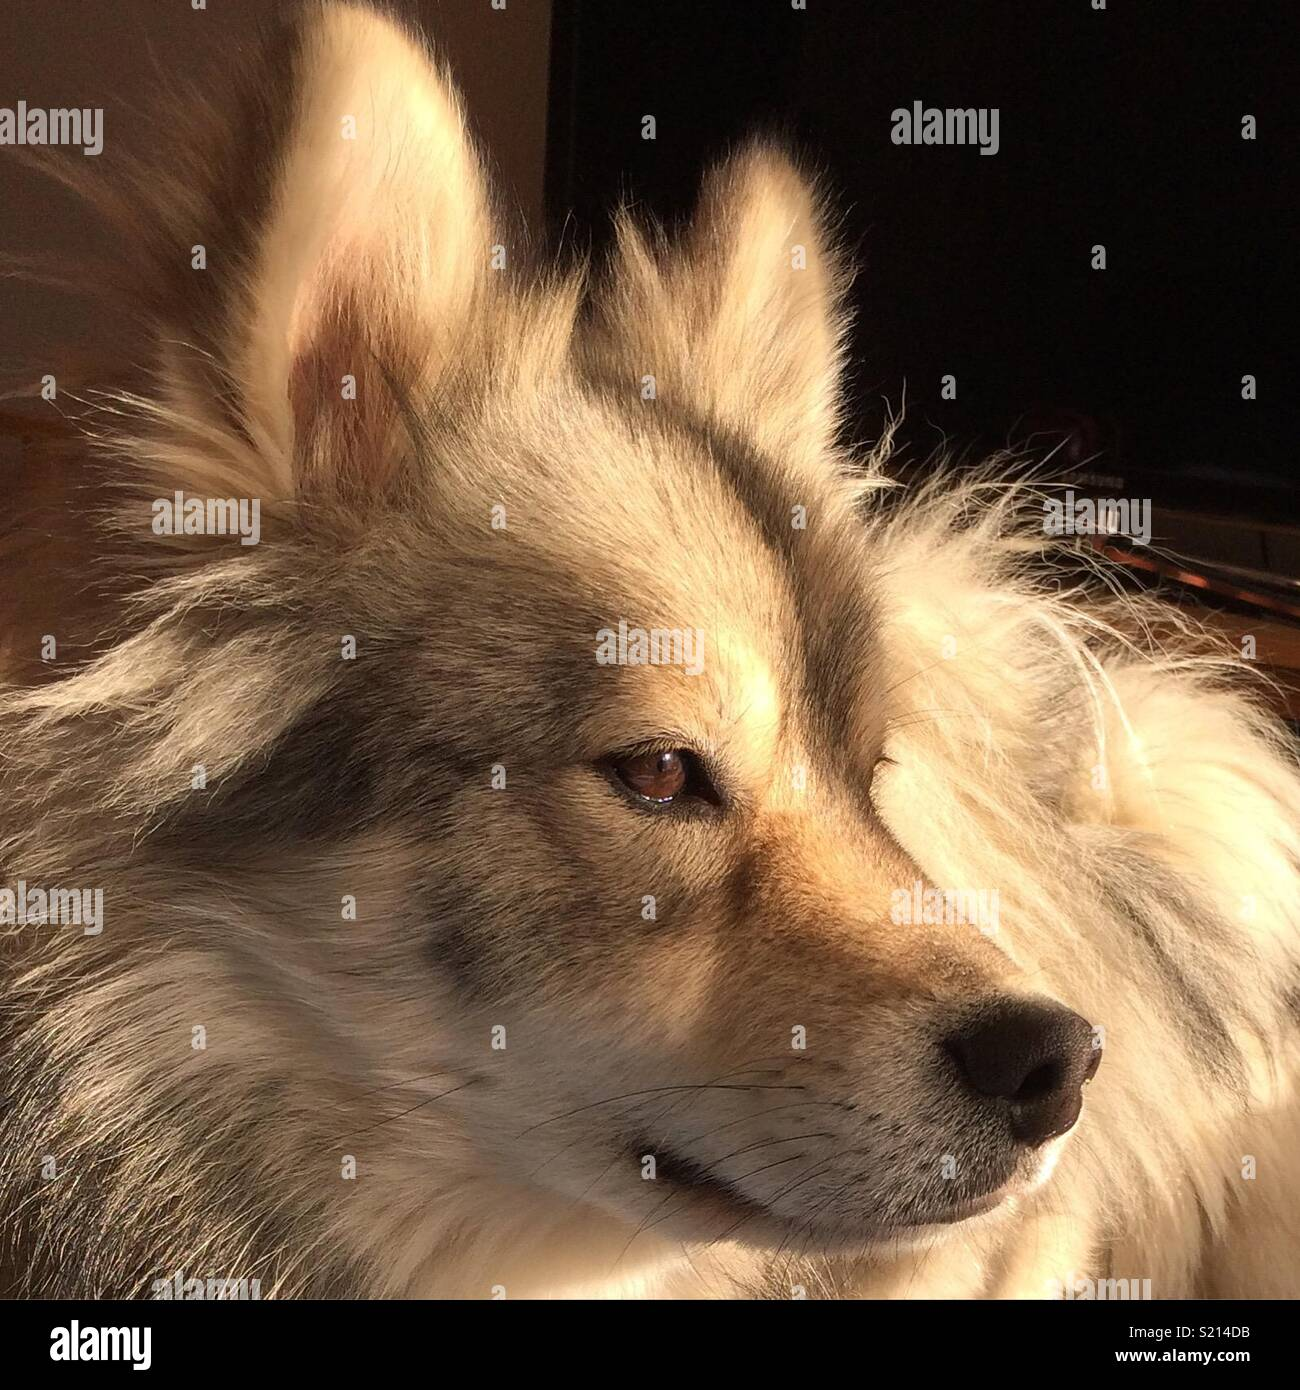 Fluffy dog in the sun light - Stock Image